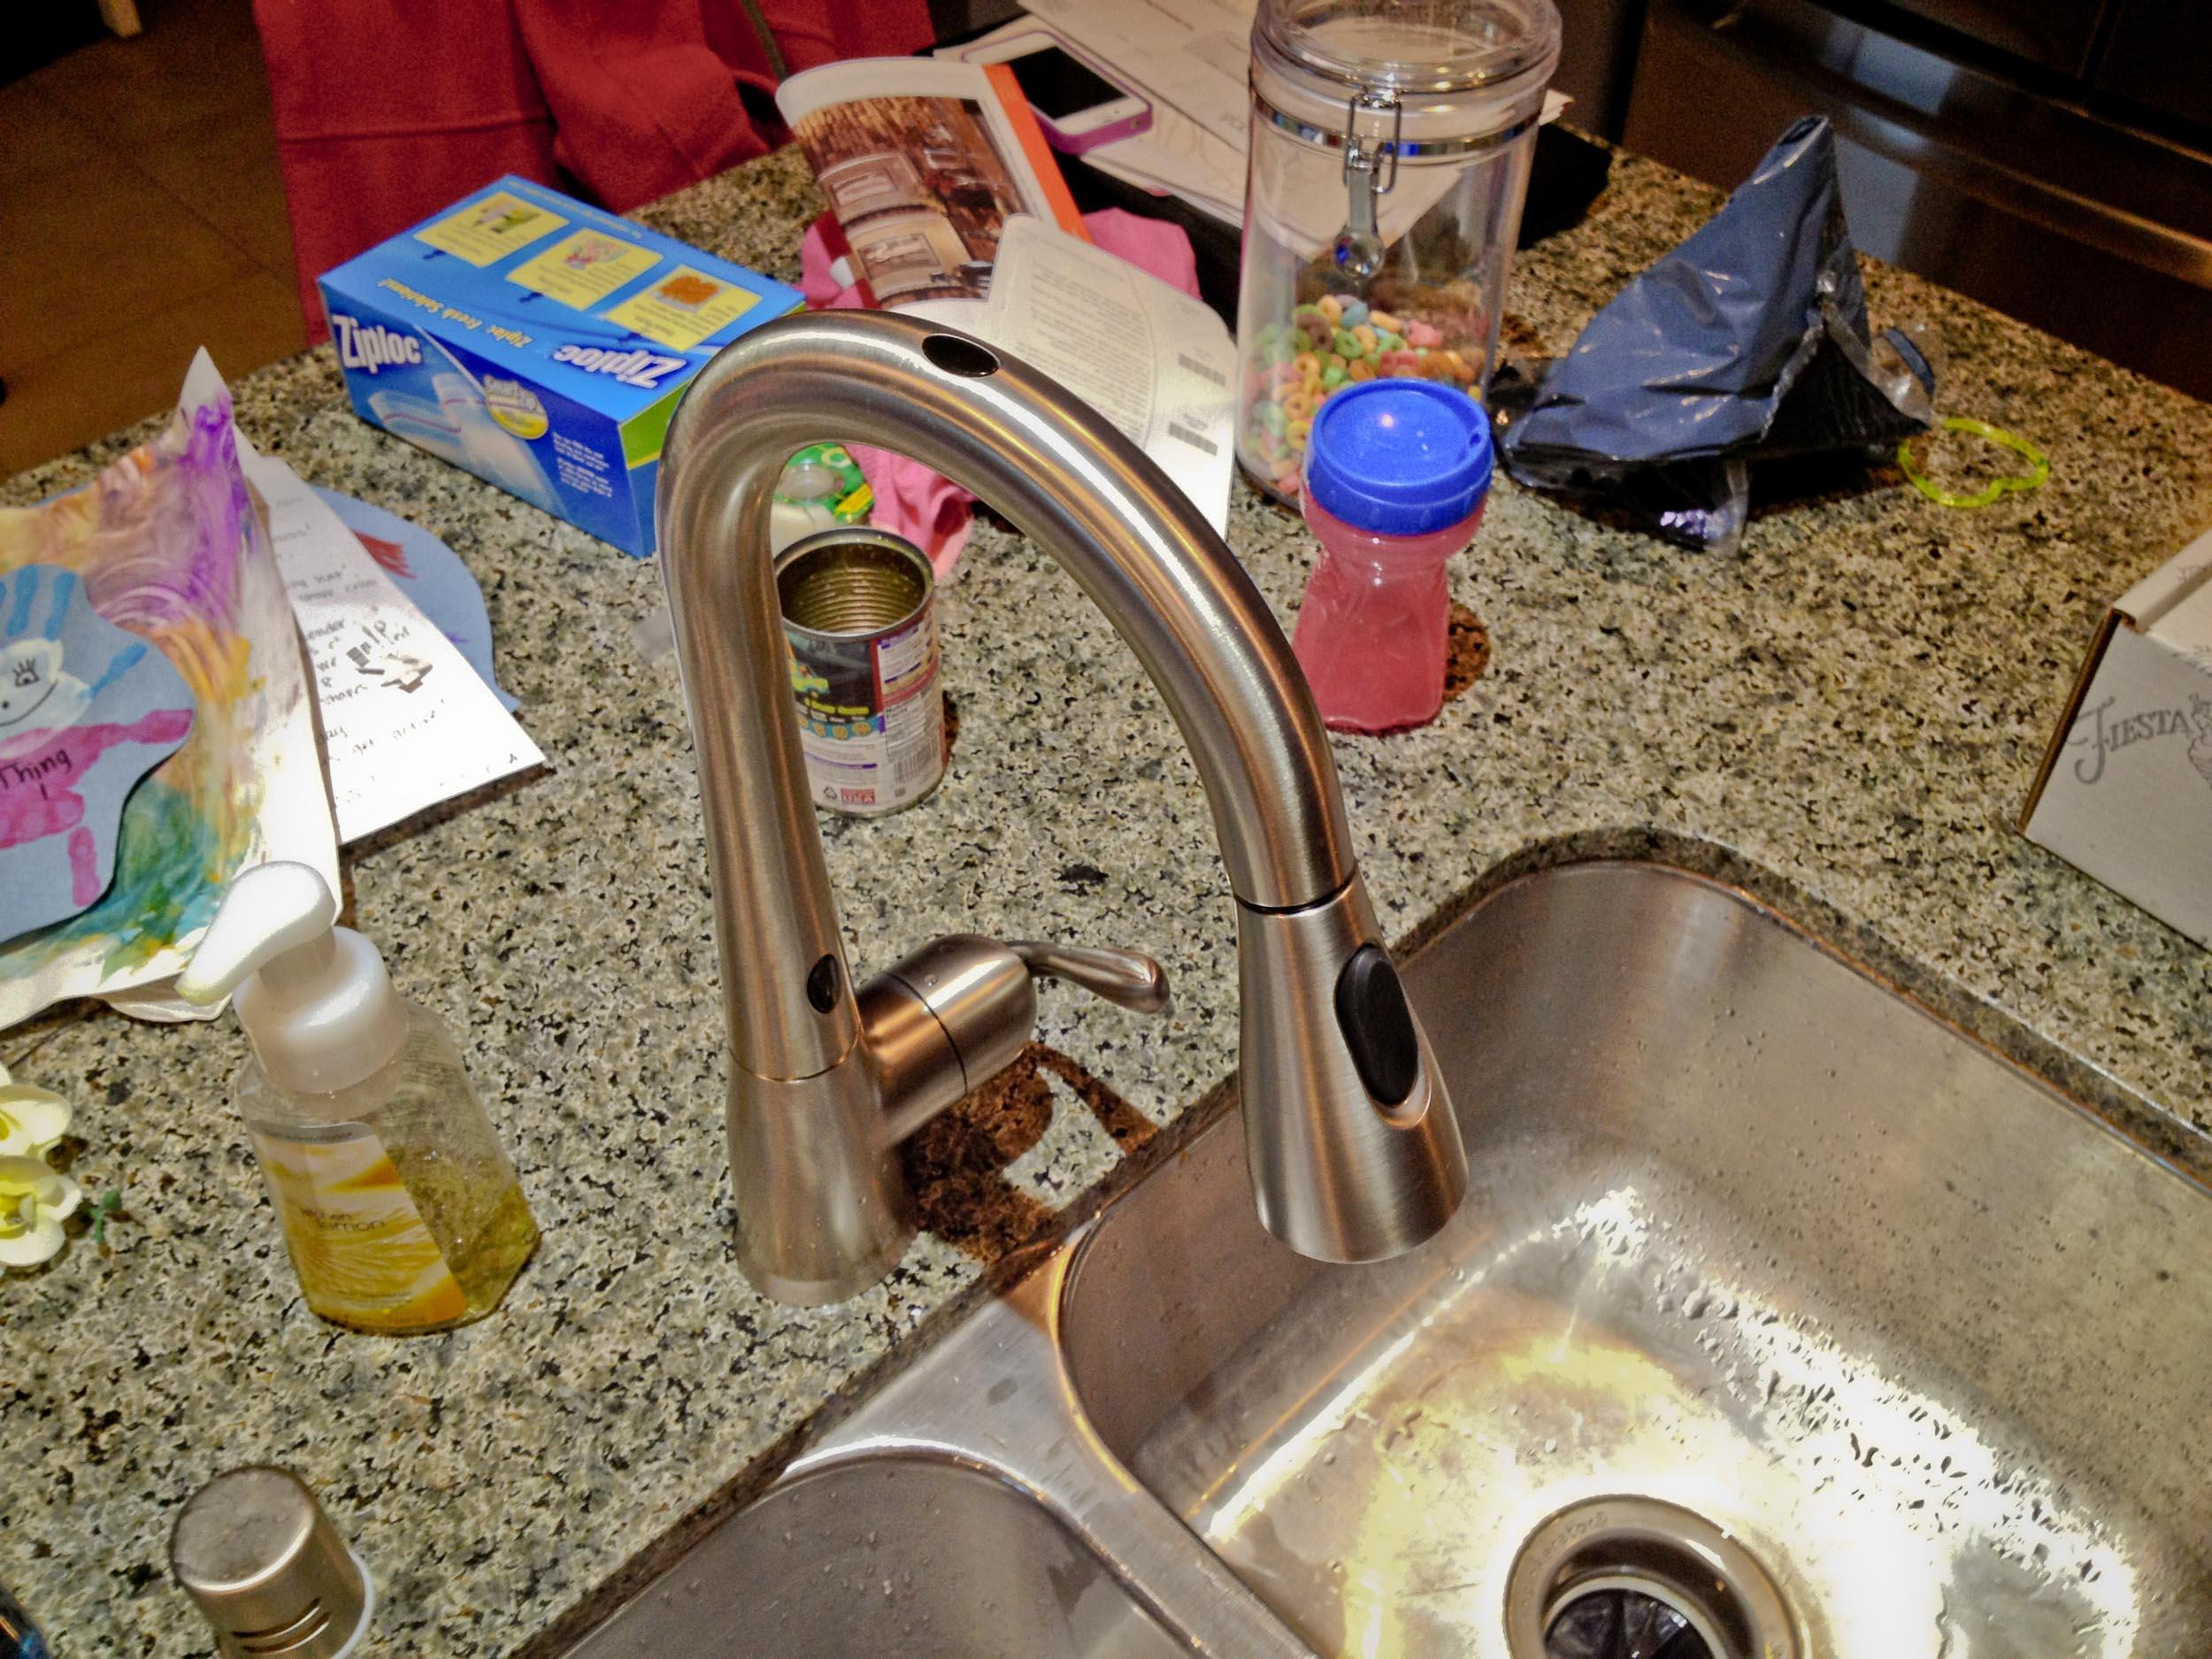 Moen Arbor with MotionSense kitchen faucet | Windy Pinwheel